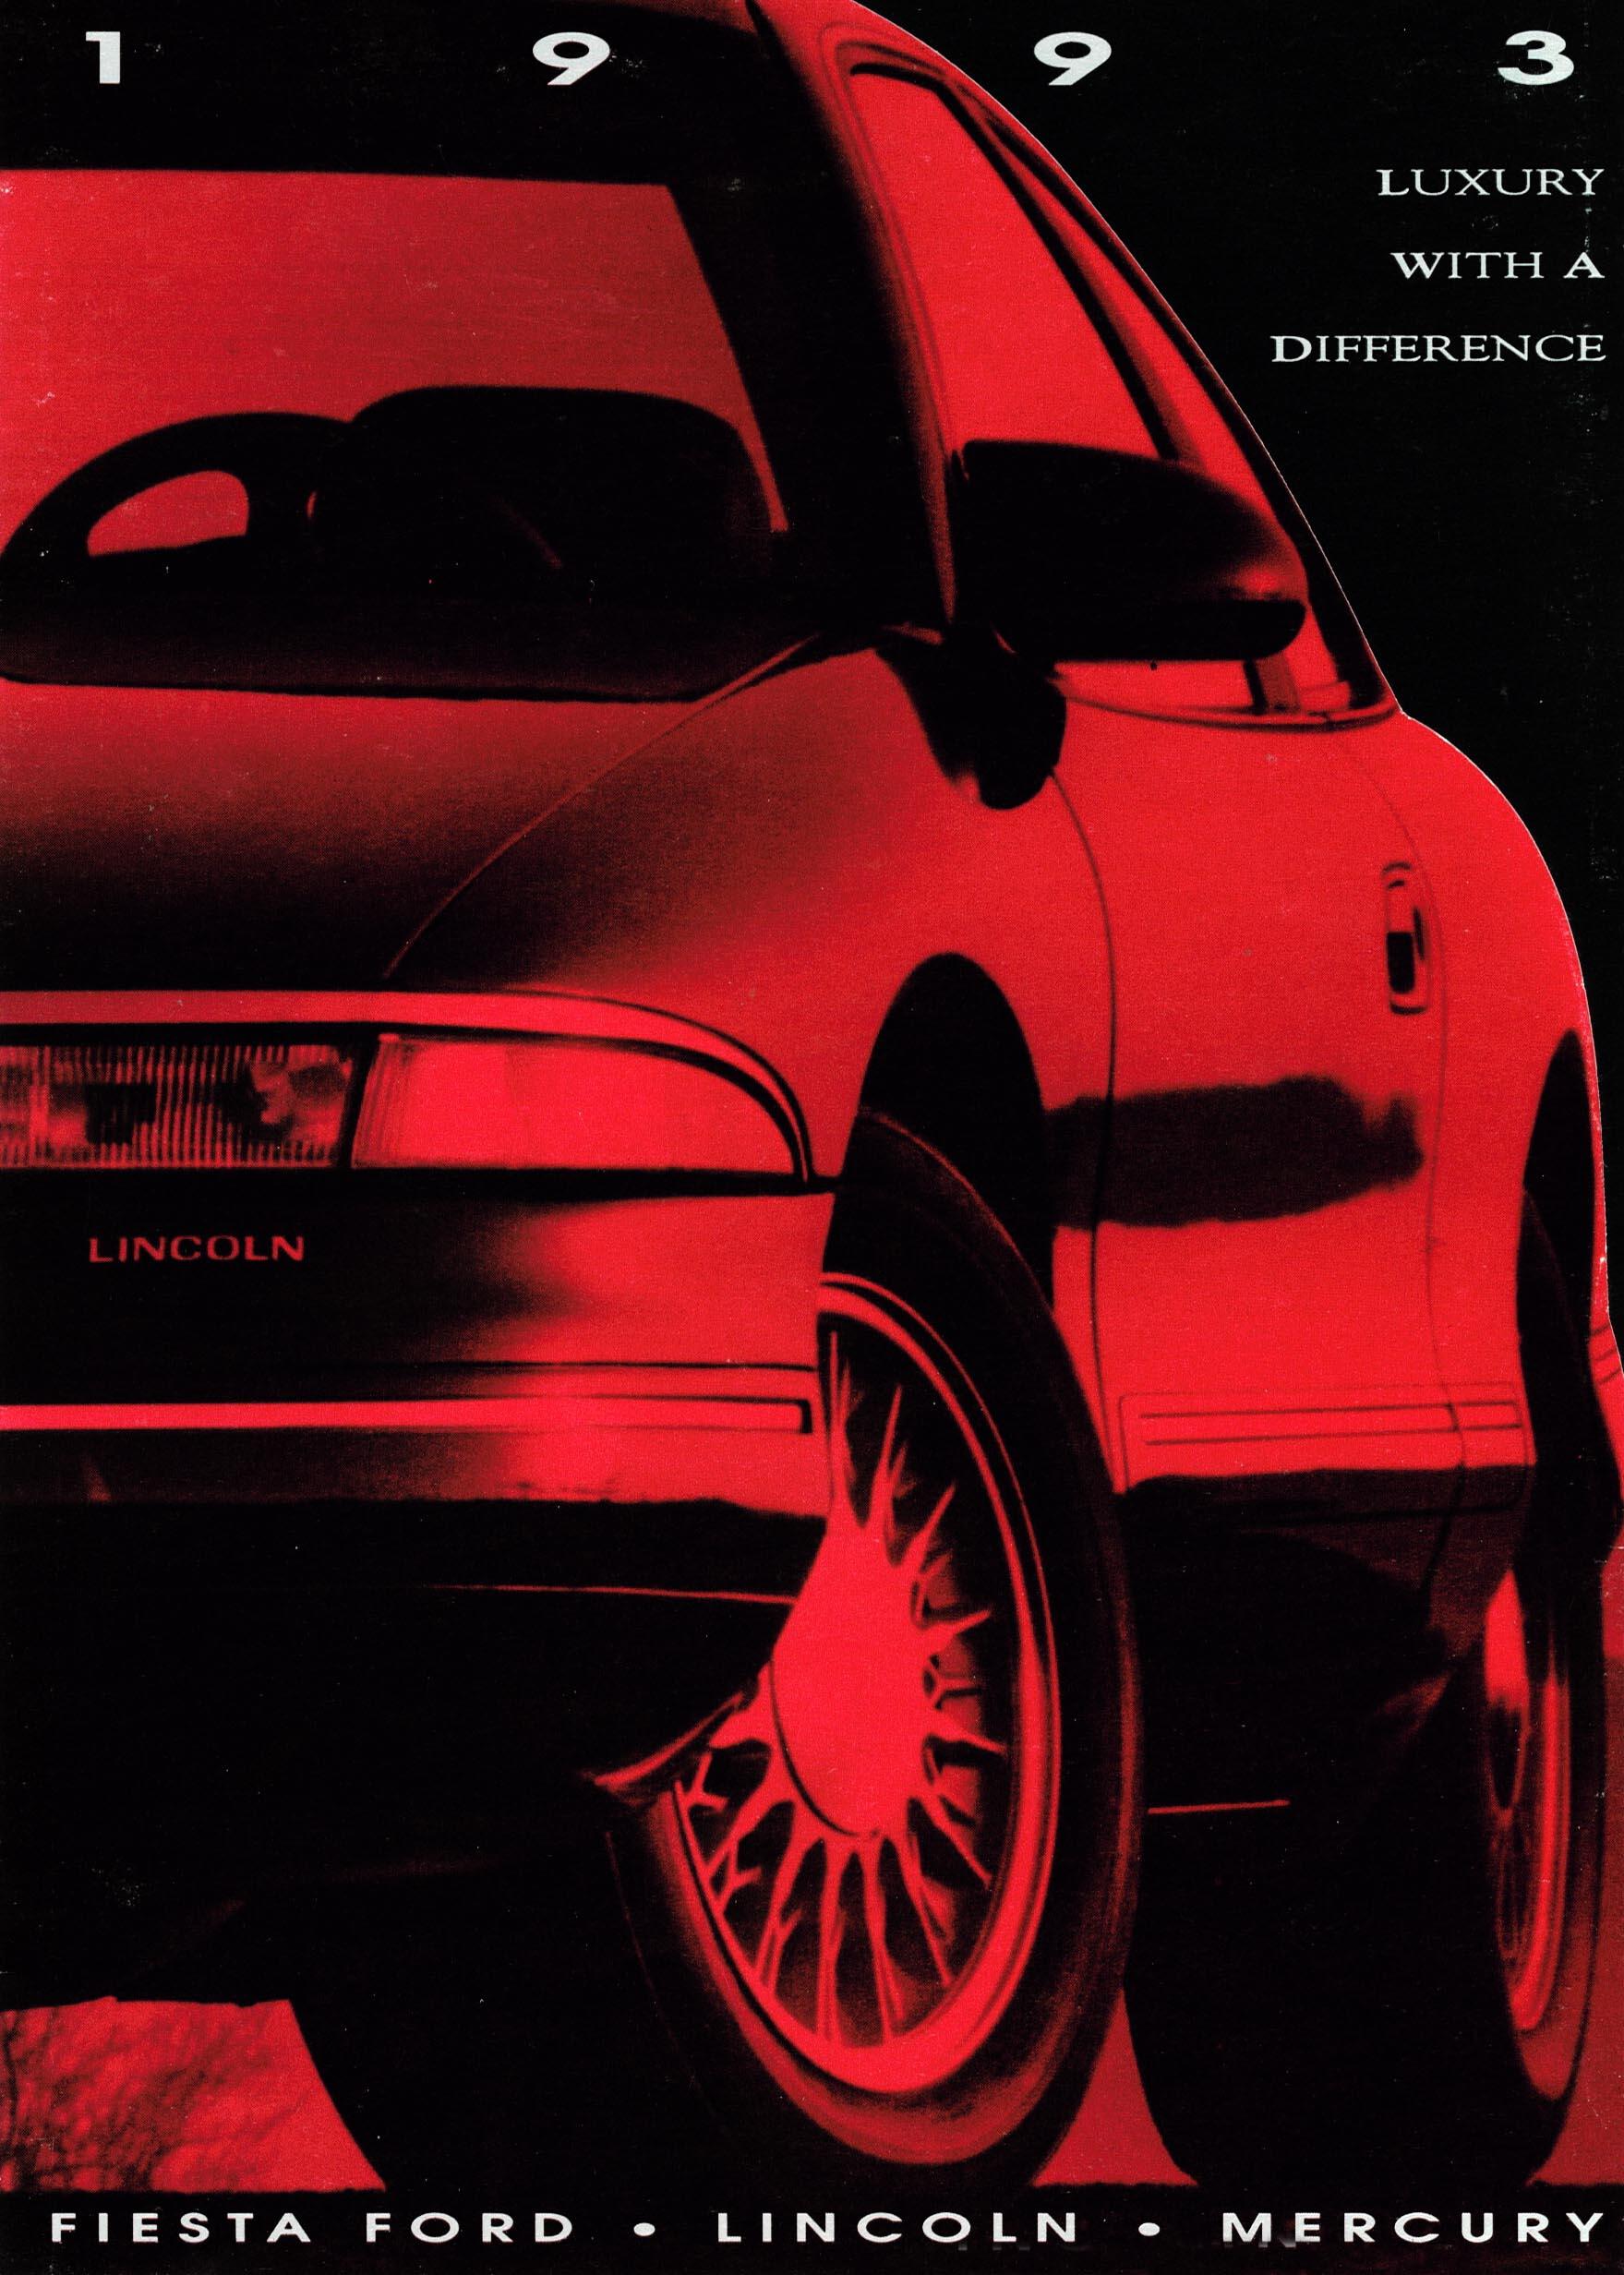 Ford mailer cover.jpg